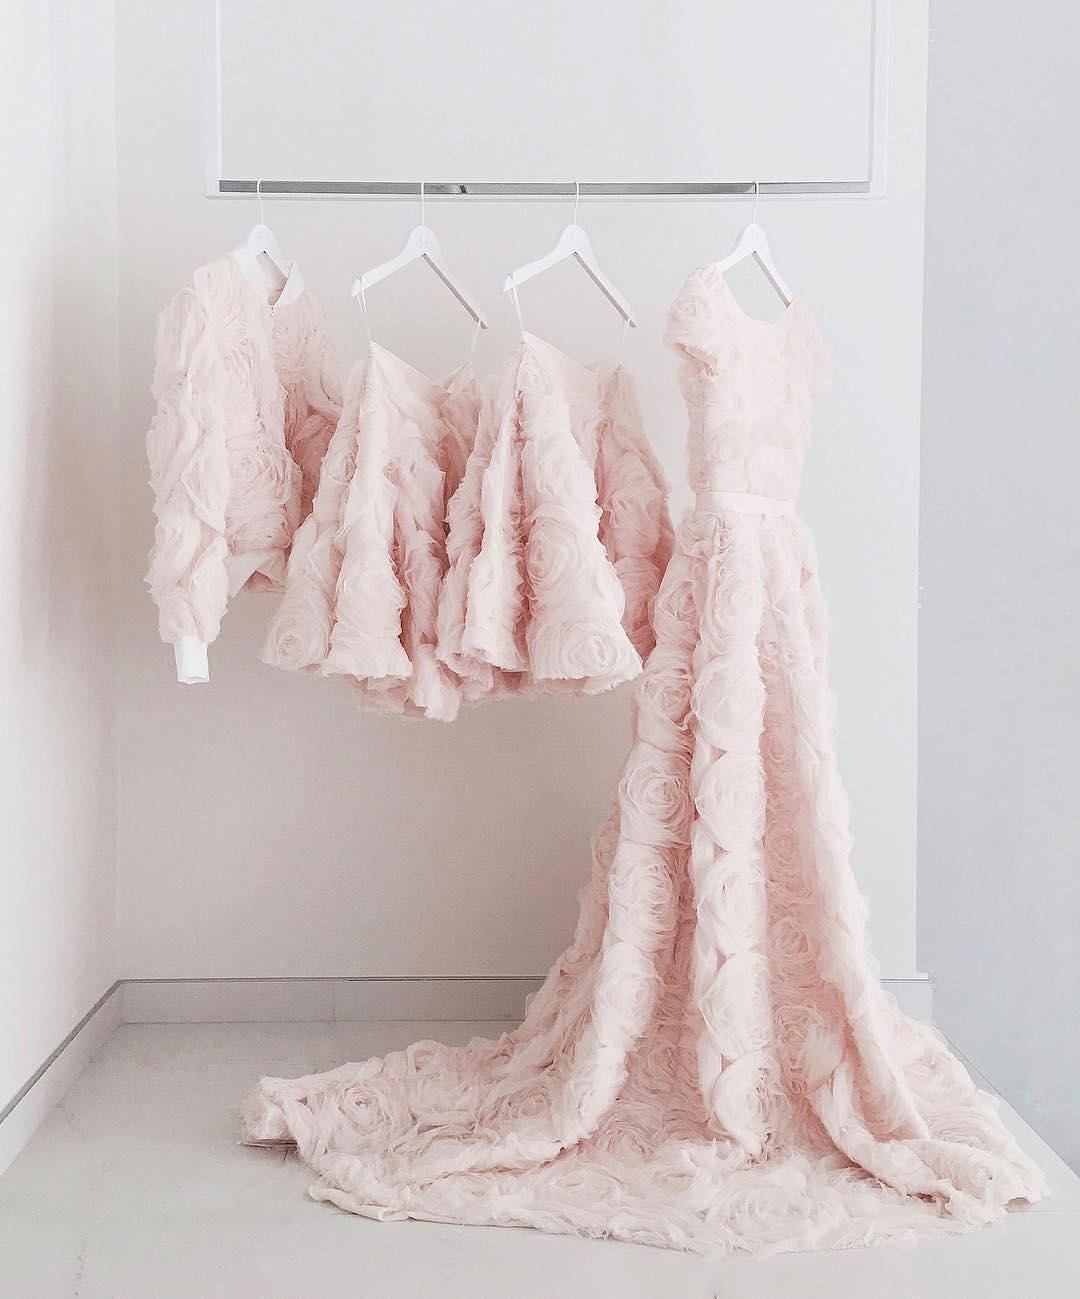 Inspirasi Gaun Pengantin Warna Merah Muda